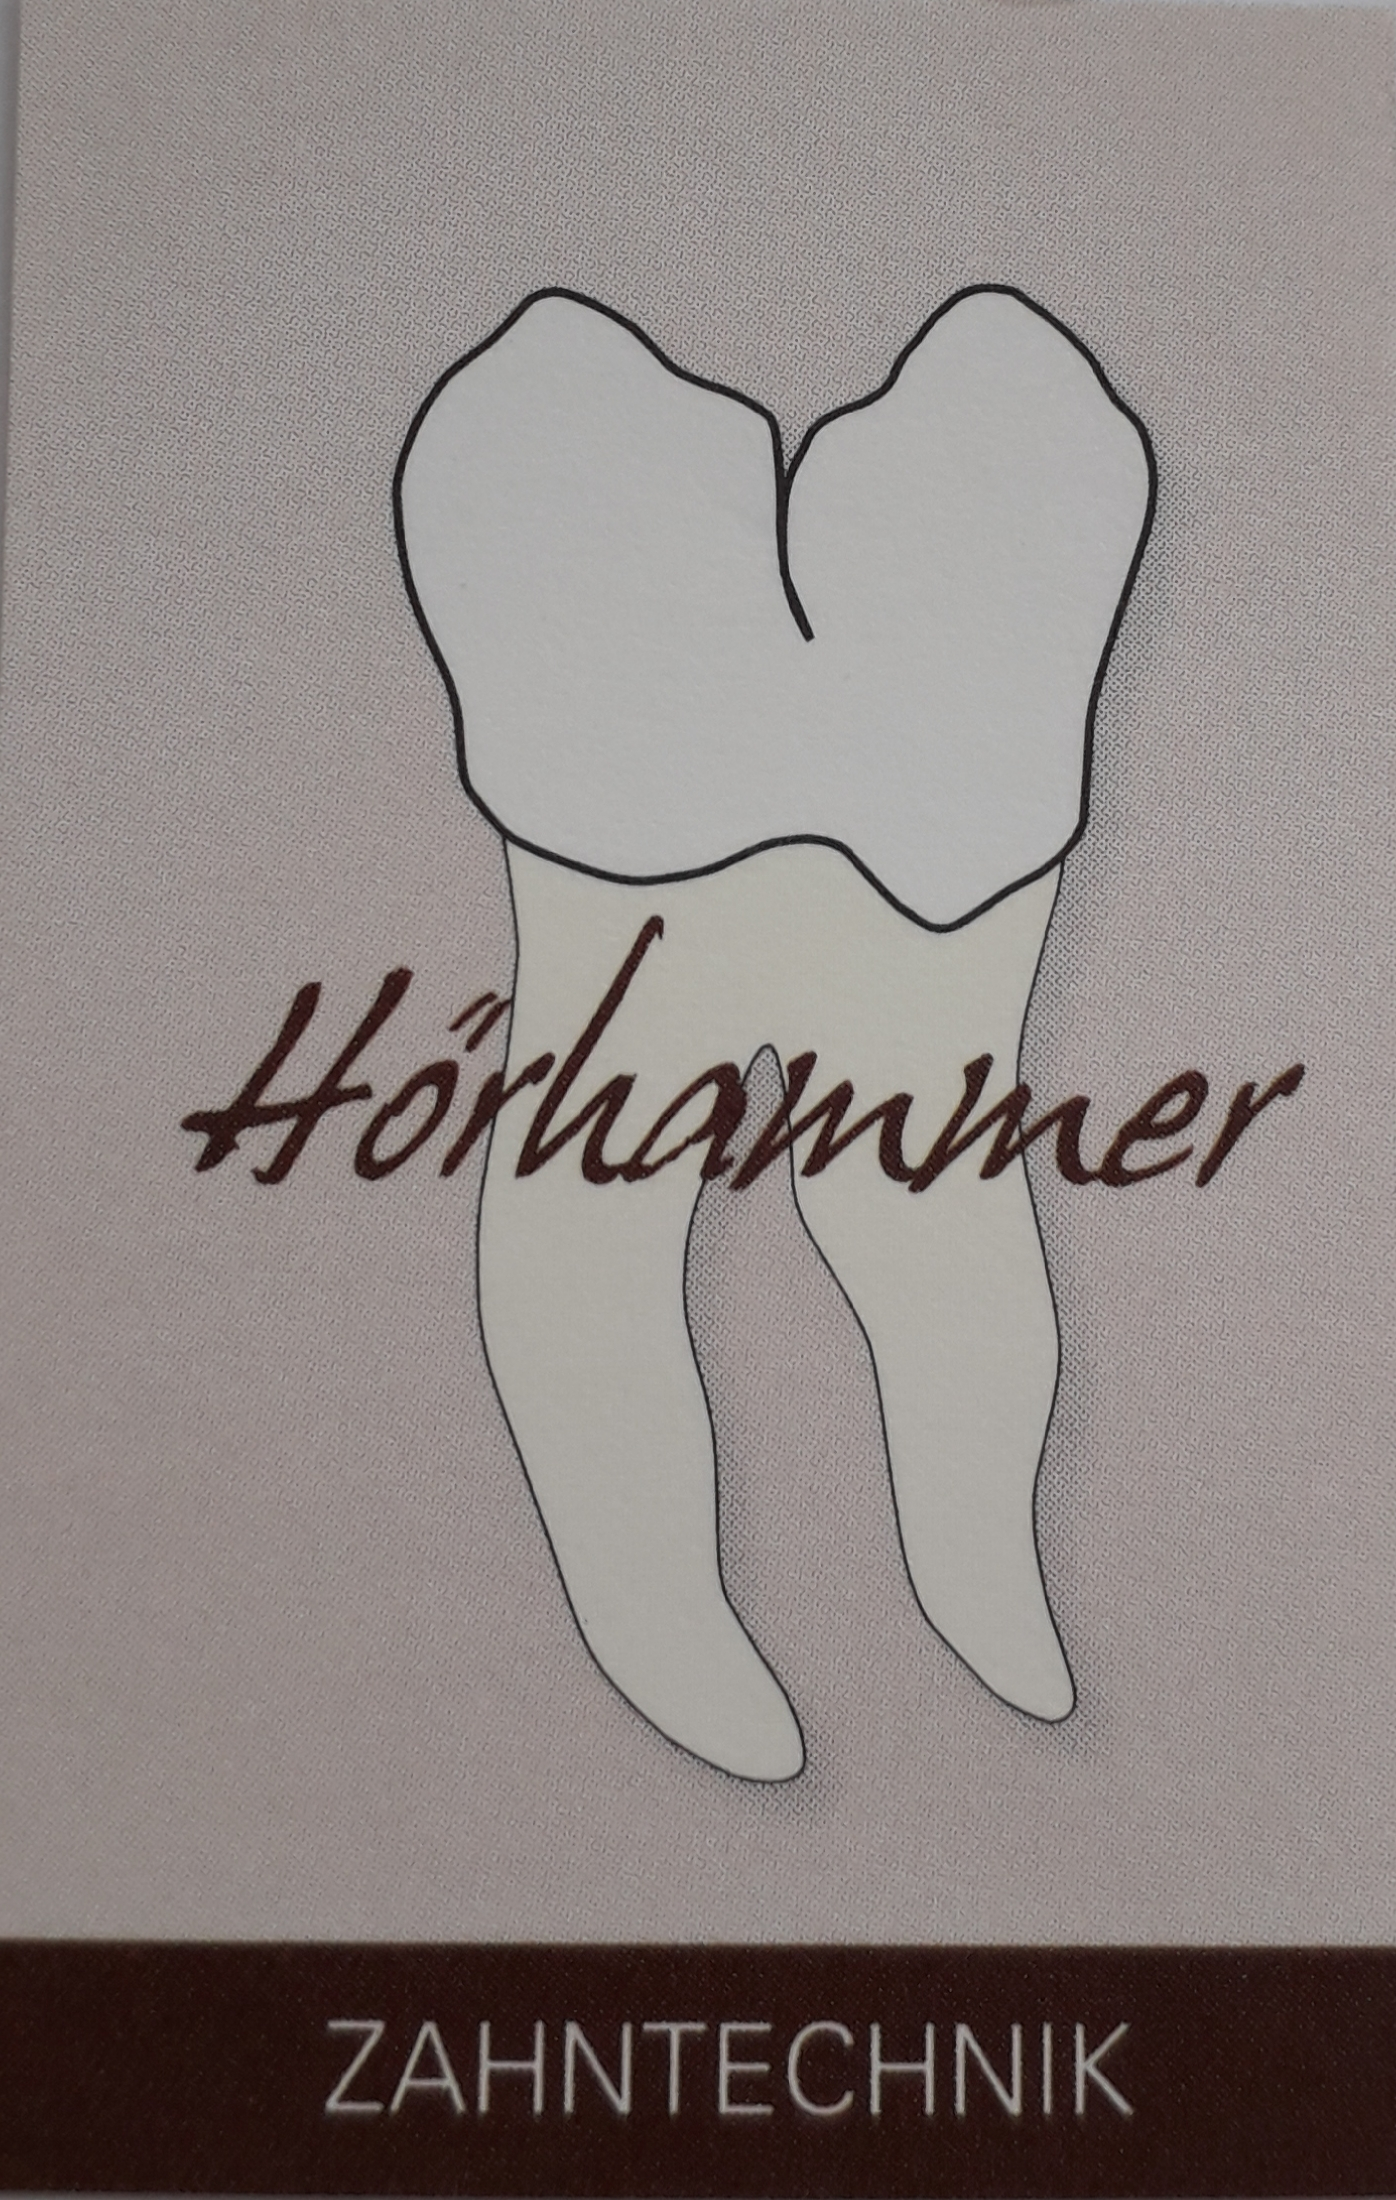 Zahntechnik Hörhammer